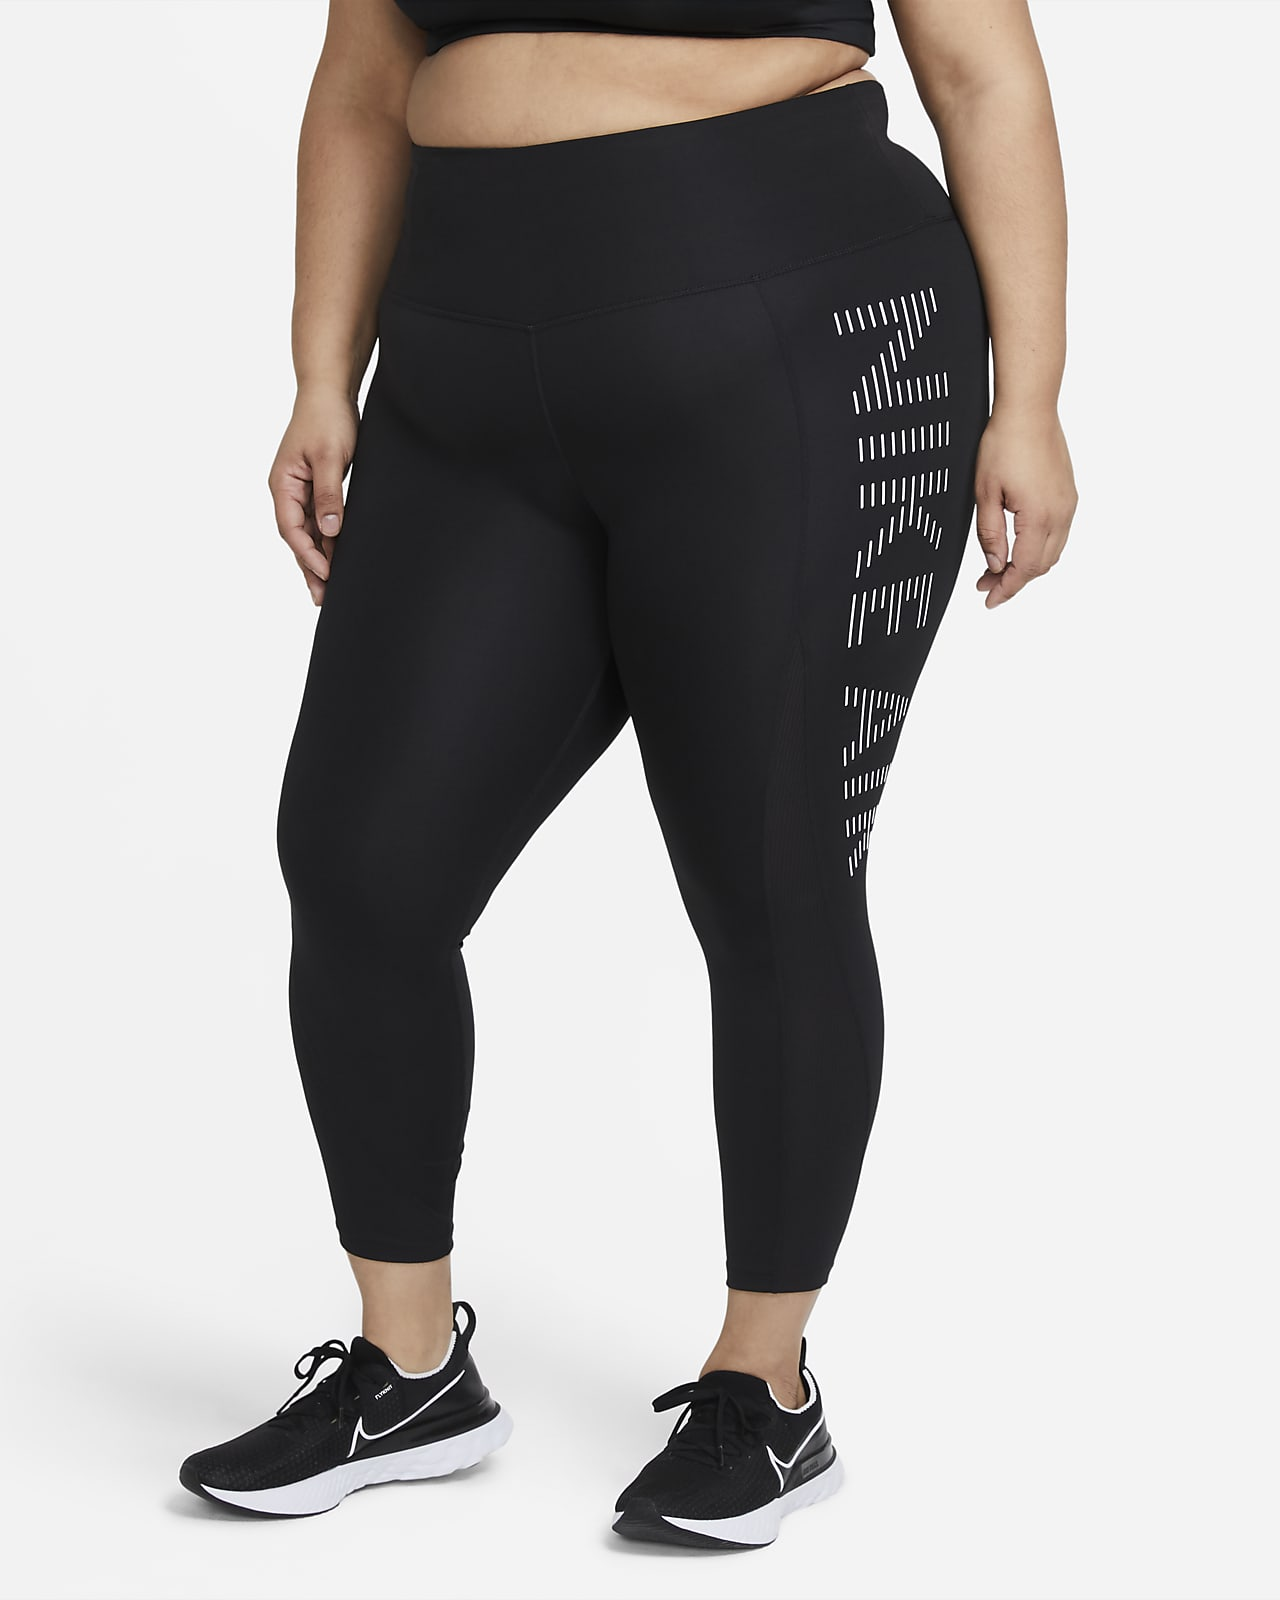 Nike Air Epic Fast Women's 7/8-Length Running Leggings (Plus Size)